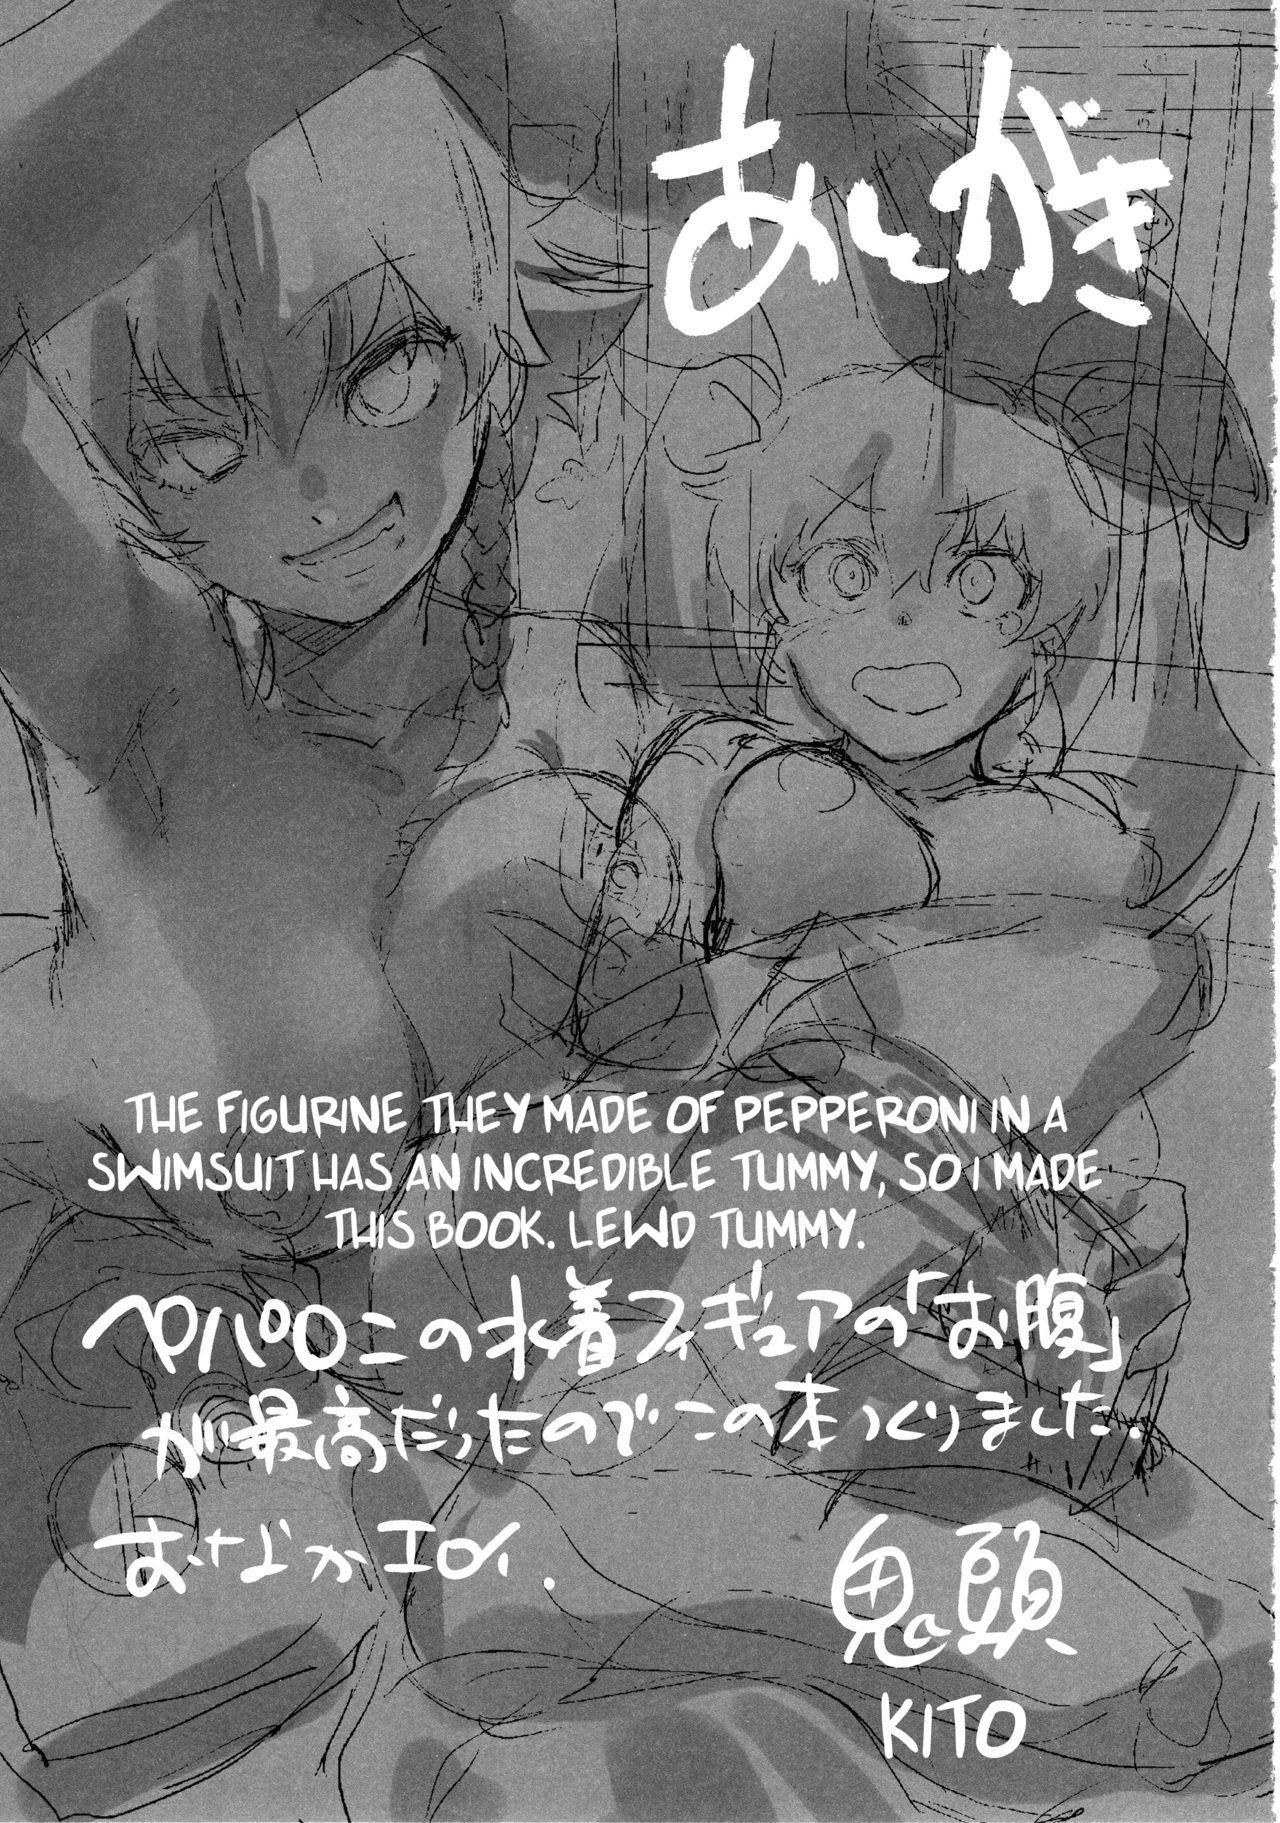 (COMIC1☆13) [Camrism (Kito Sakeru)] Anchovy Nee-san no Bouillon Panty Sakusen-ssu! (Girls und Panzer) [English] [DITSHICK] 22